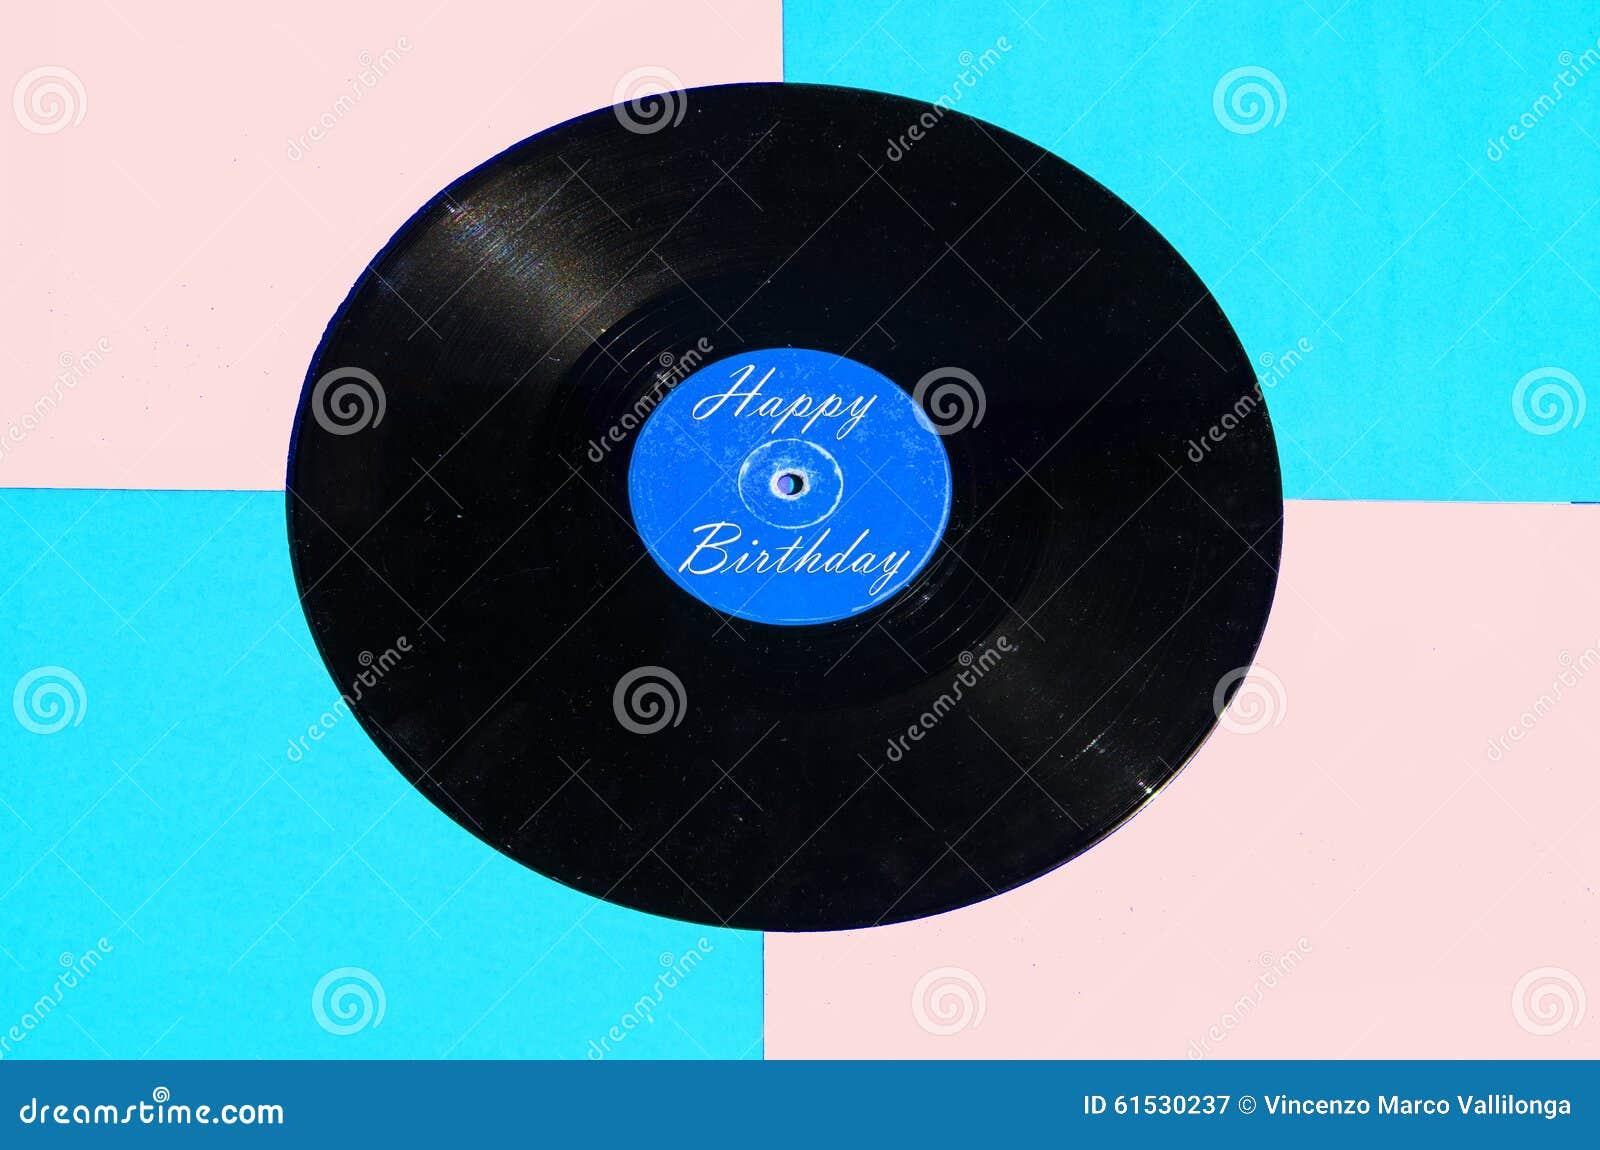 Happy Birthday Vinyl And Colored Background Stock Photo